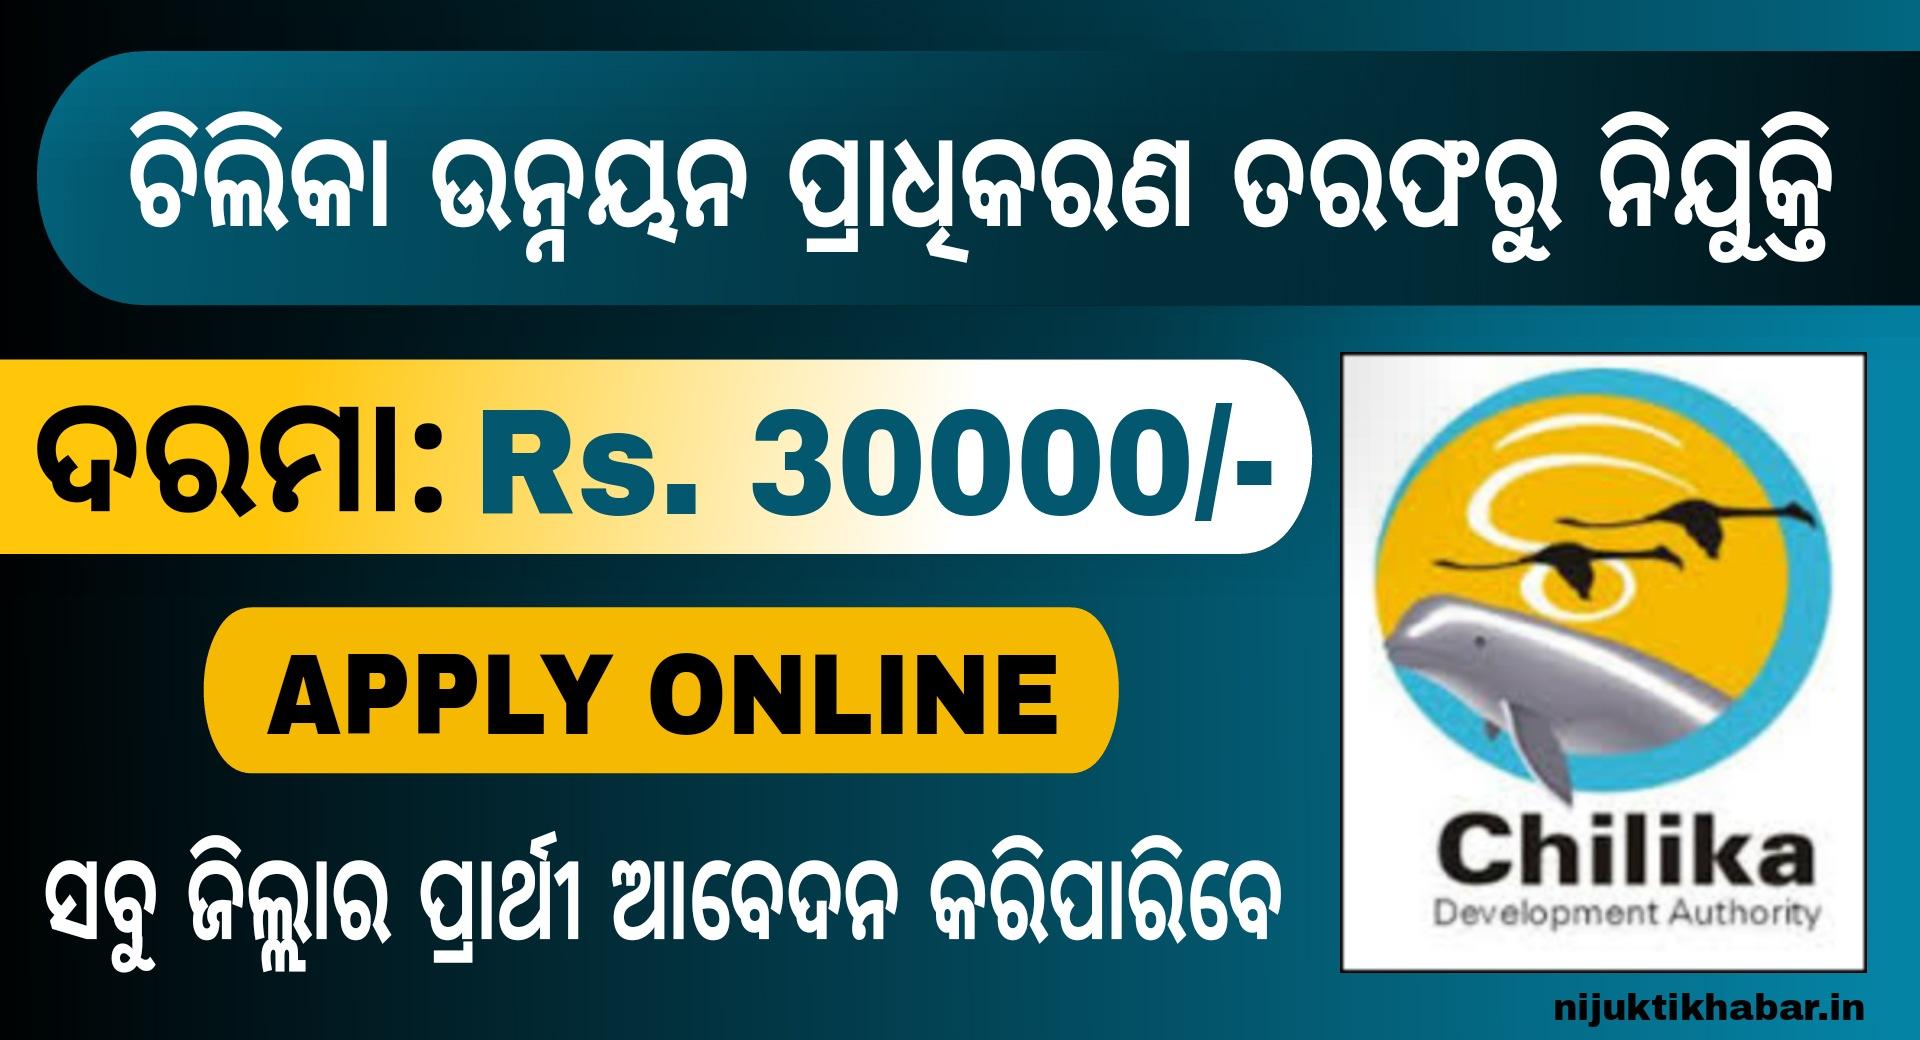 Chilika Development Authority Recruitment 2021 – Jobs in Odisha